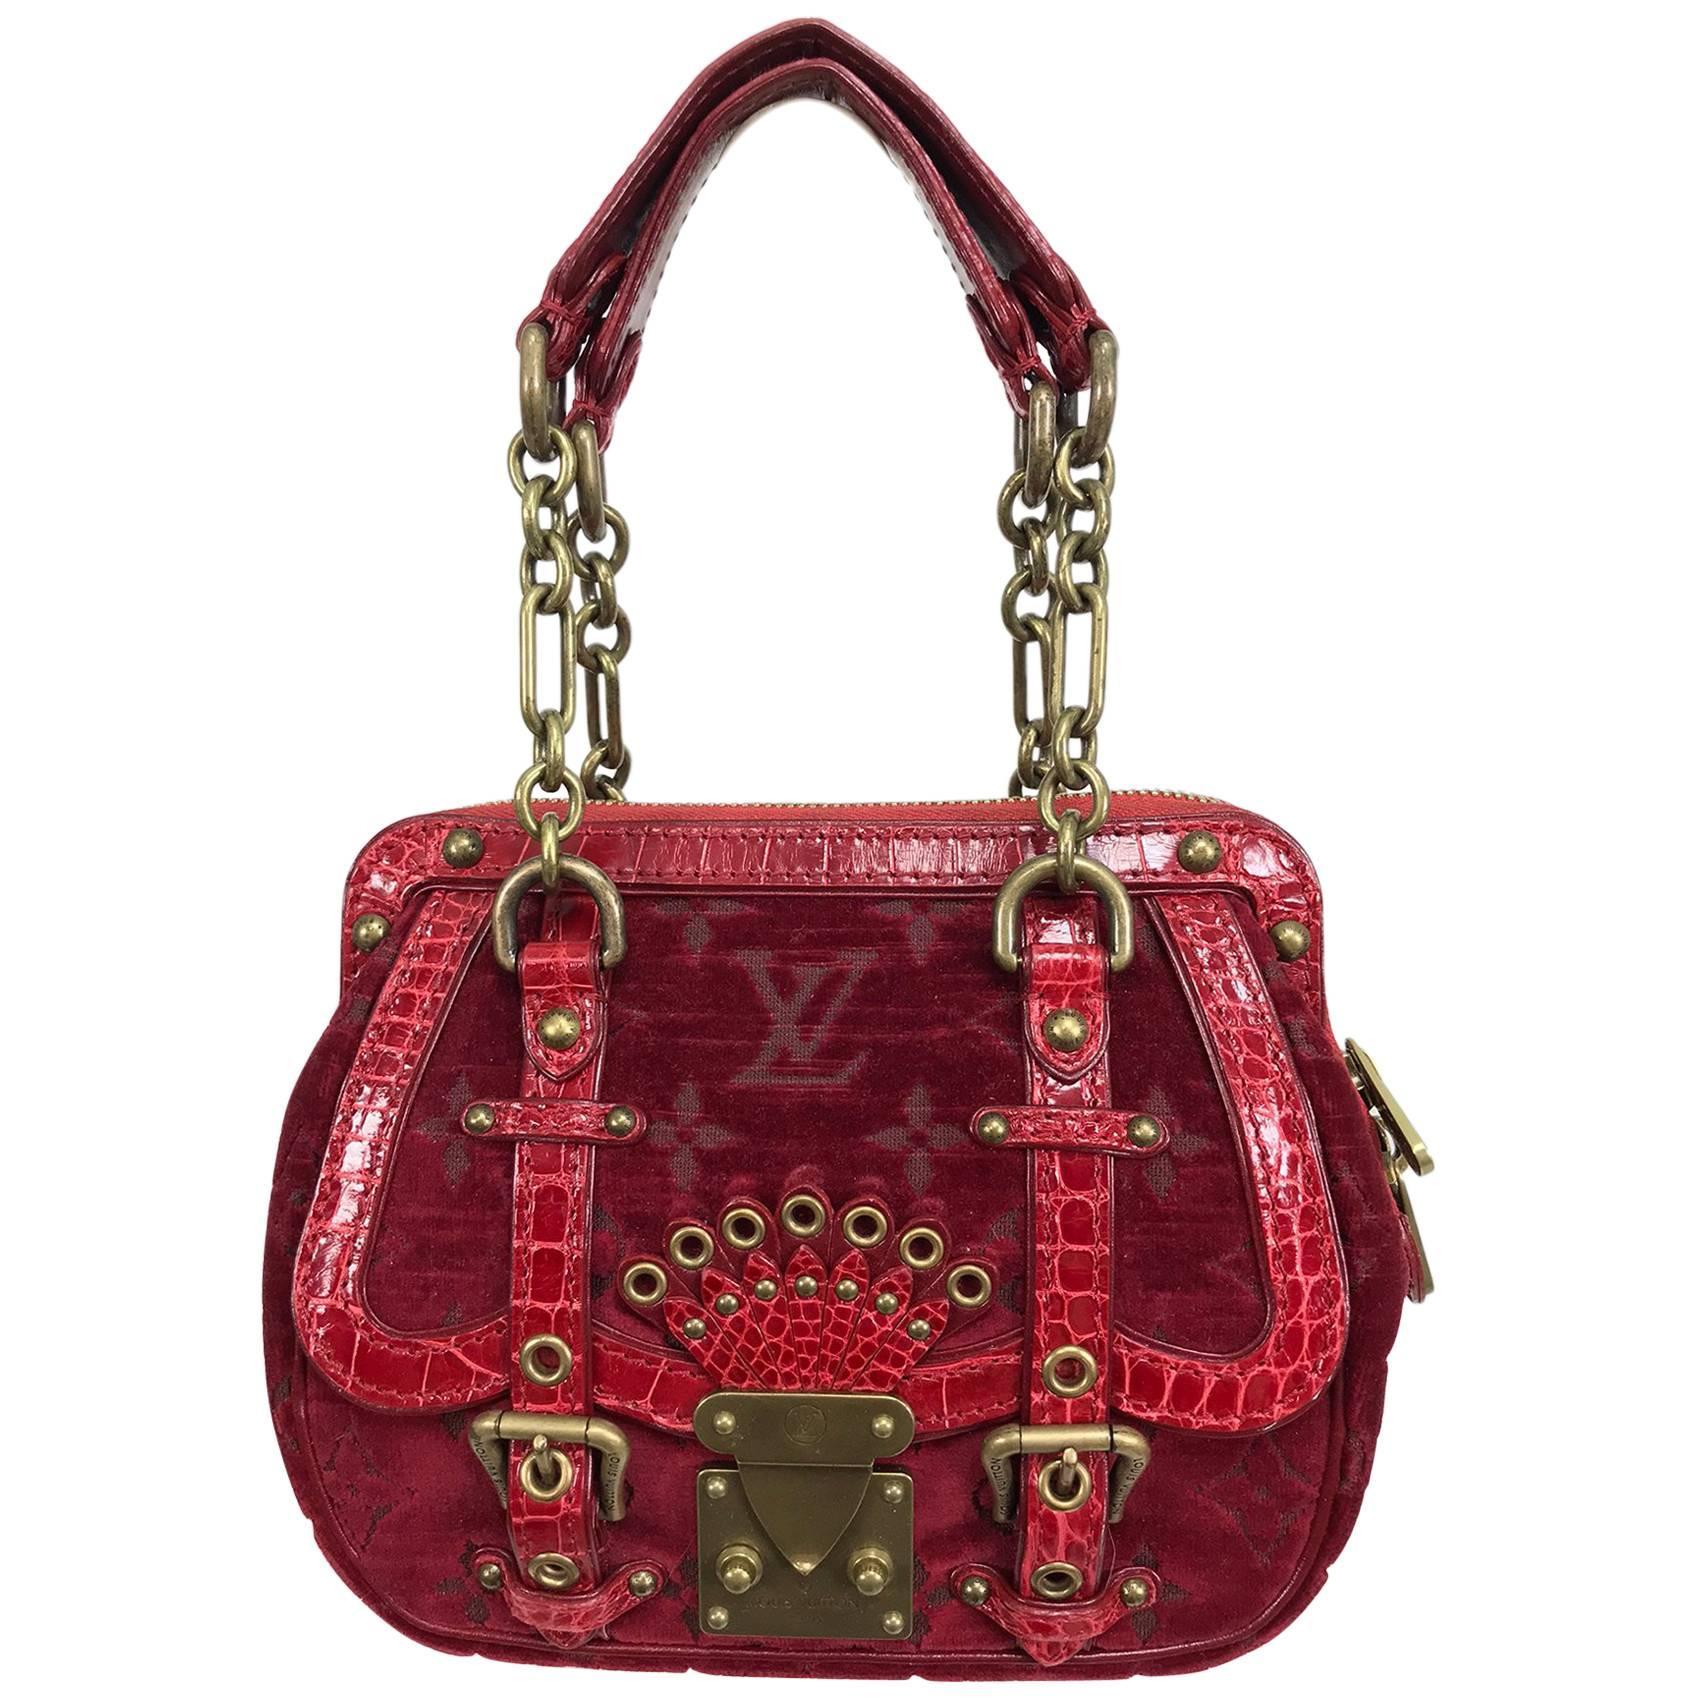 Louis Vuitton Limited Edition Velours Alligator Gracie Pm Satchel Handbag 2004 0dzv7